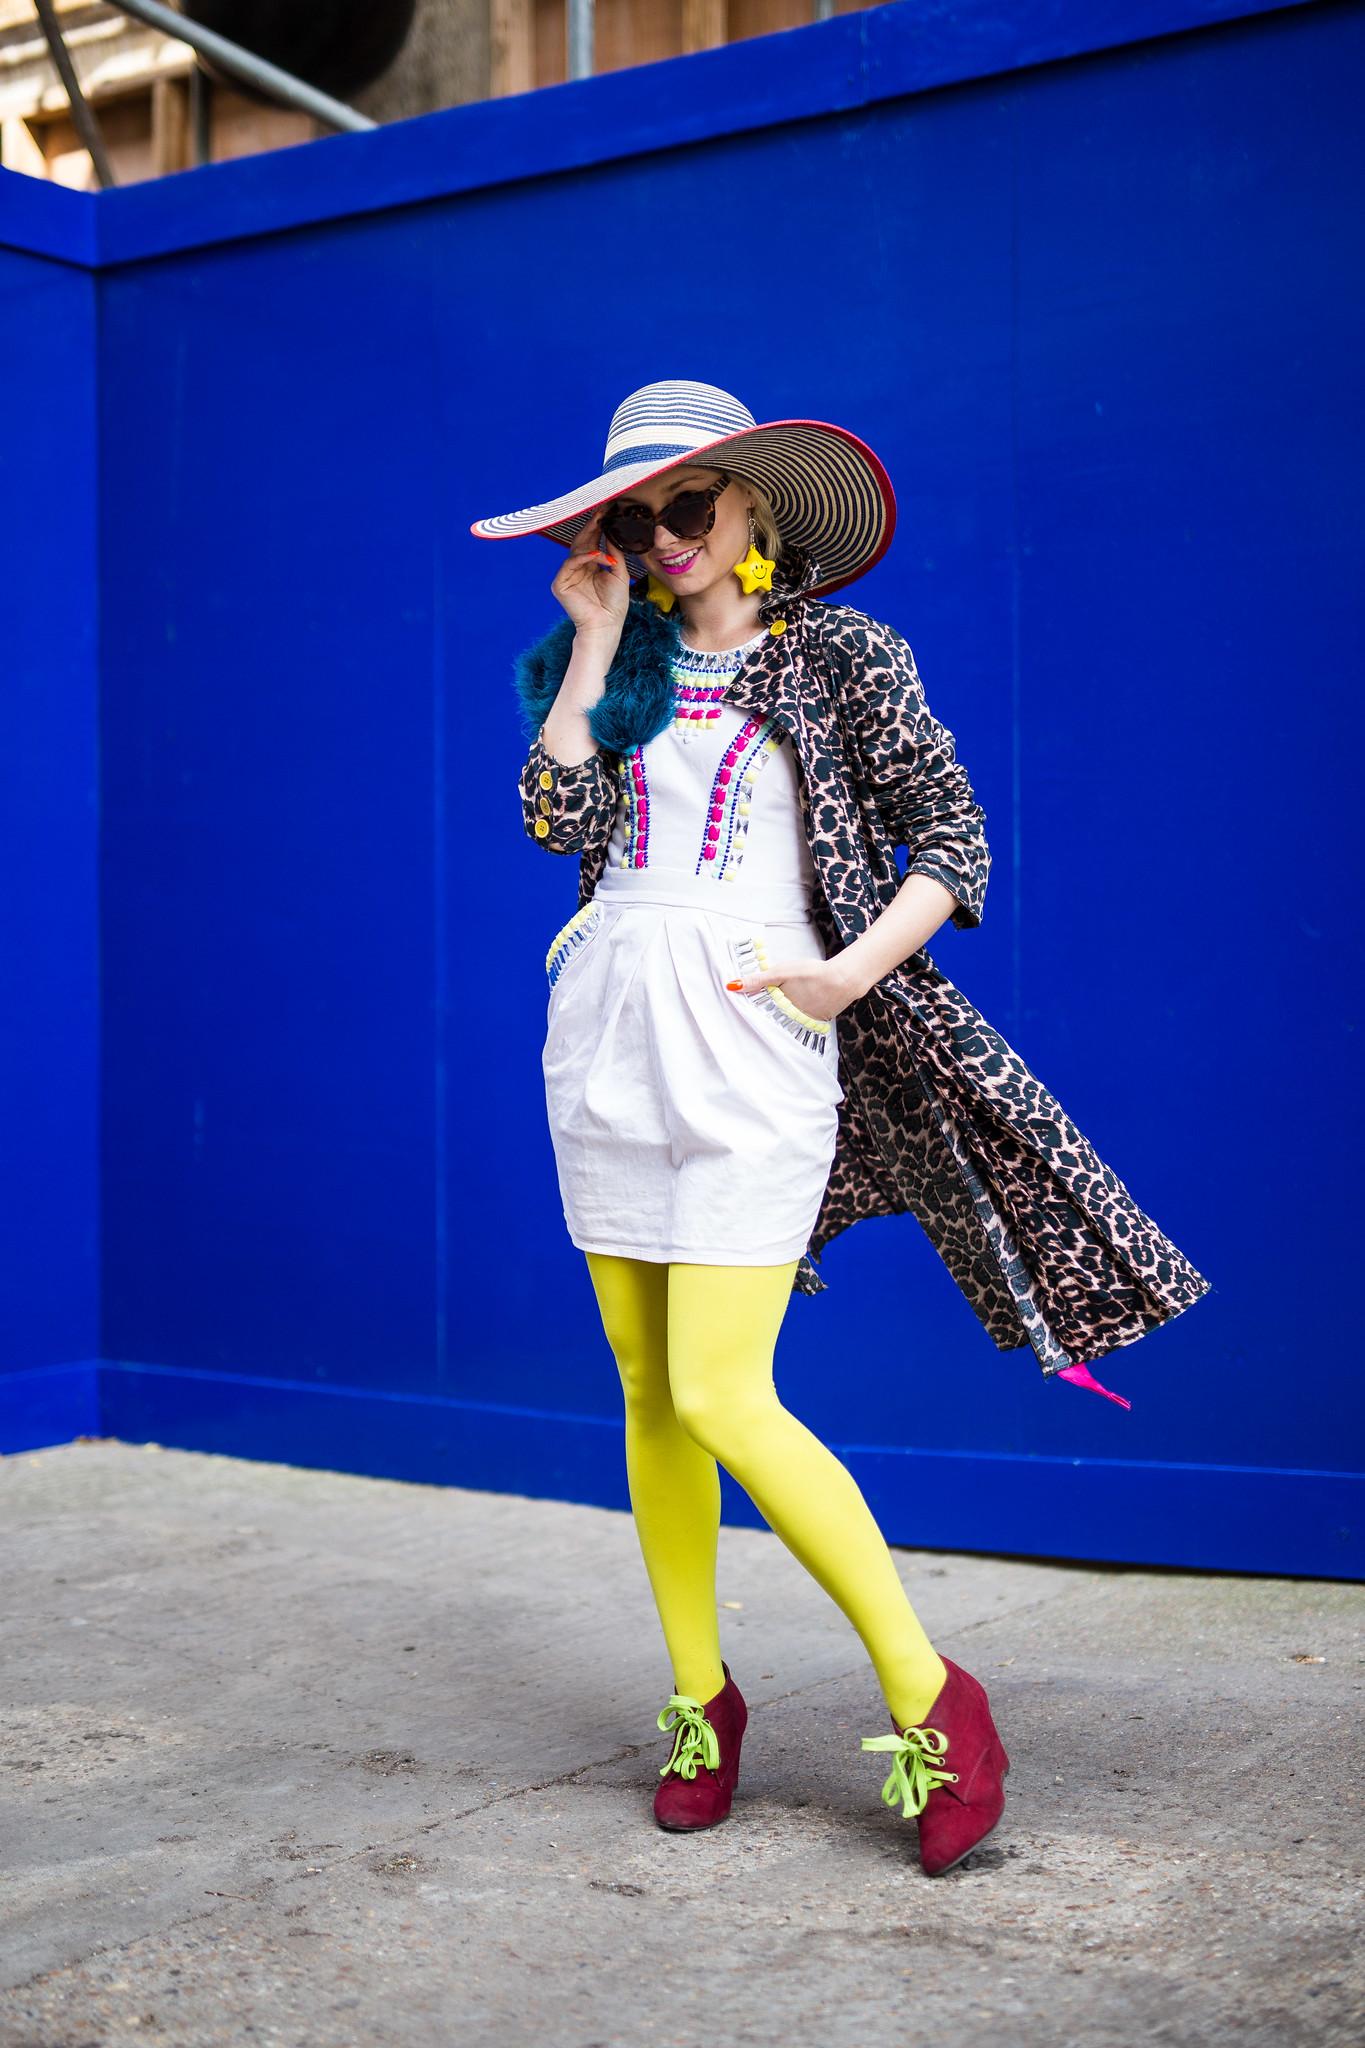 Street Style - Twinks Burnett, Graduate Fashion Week